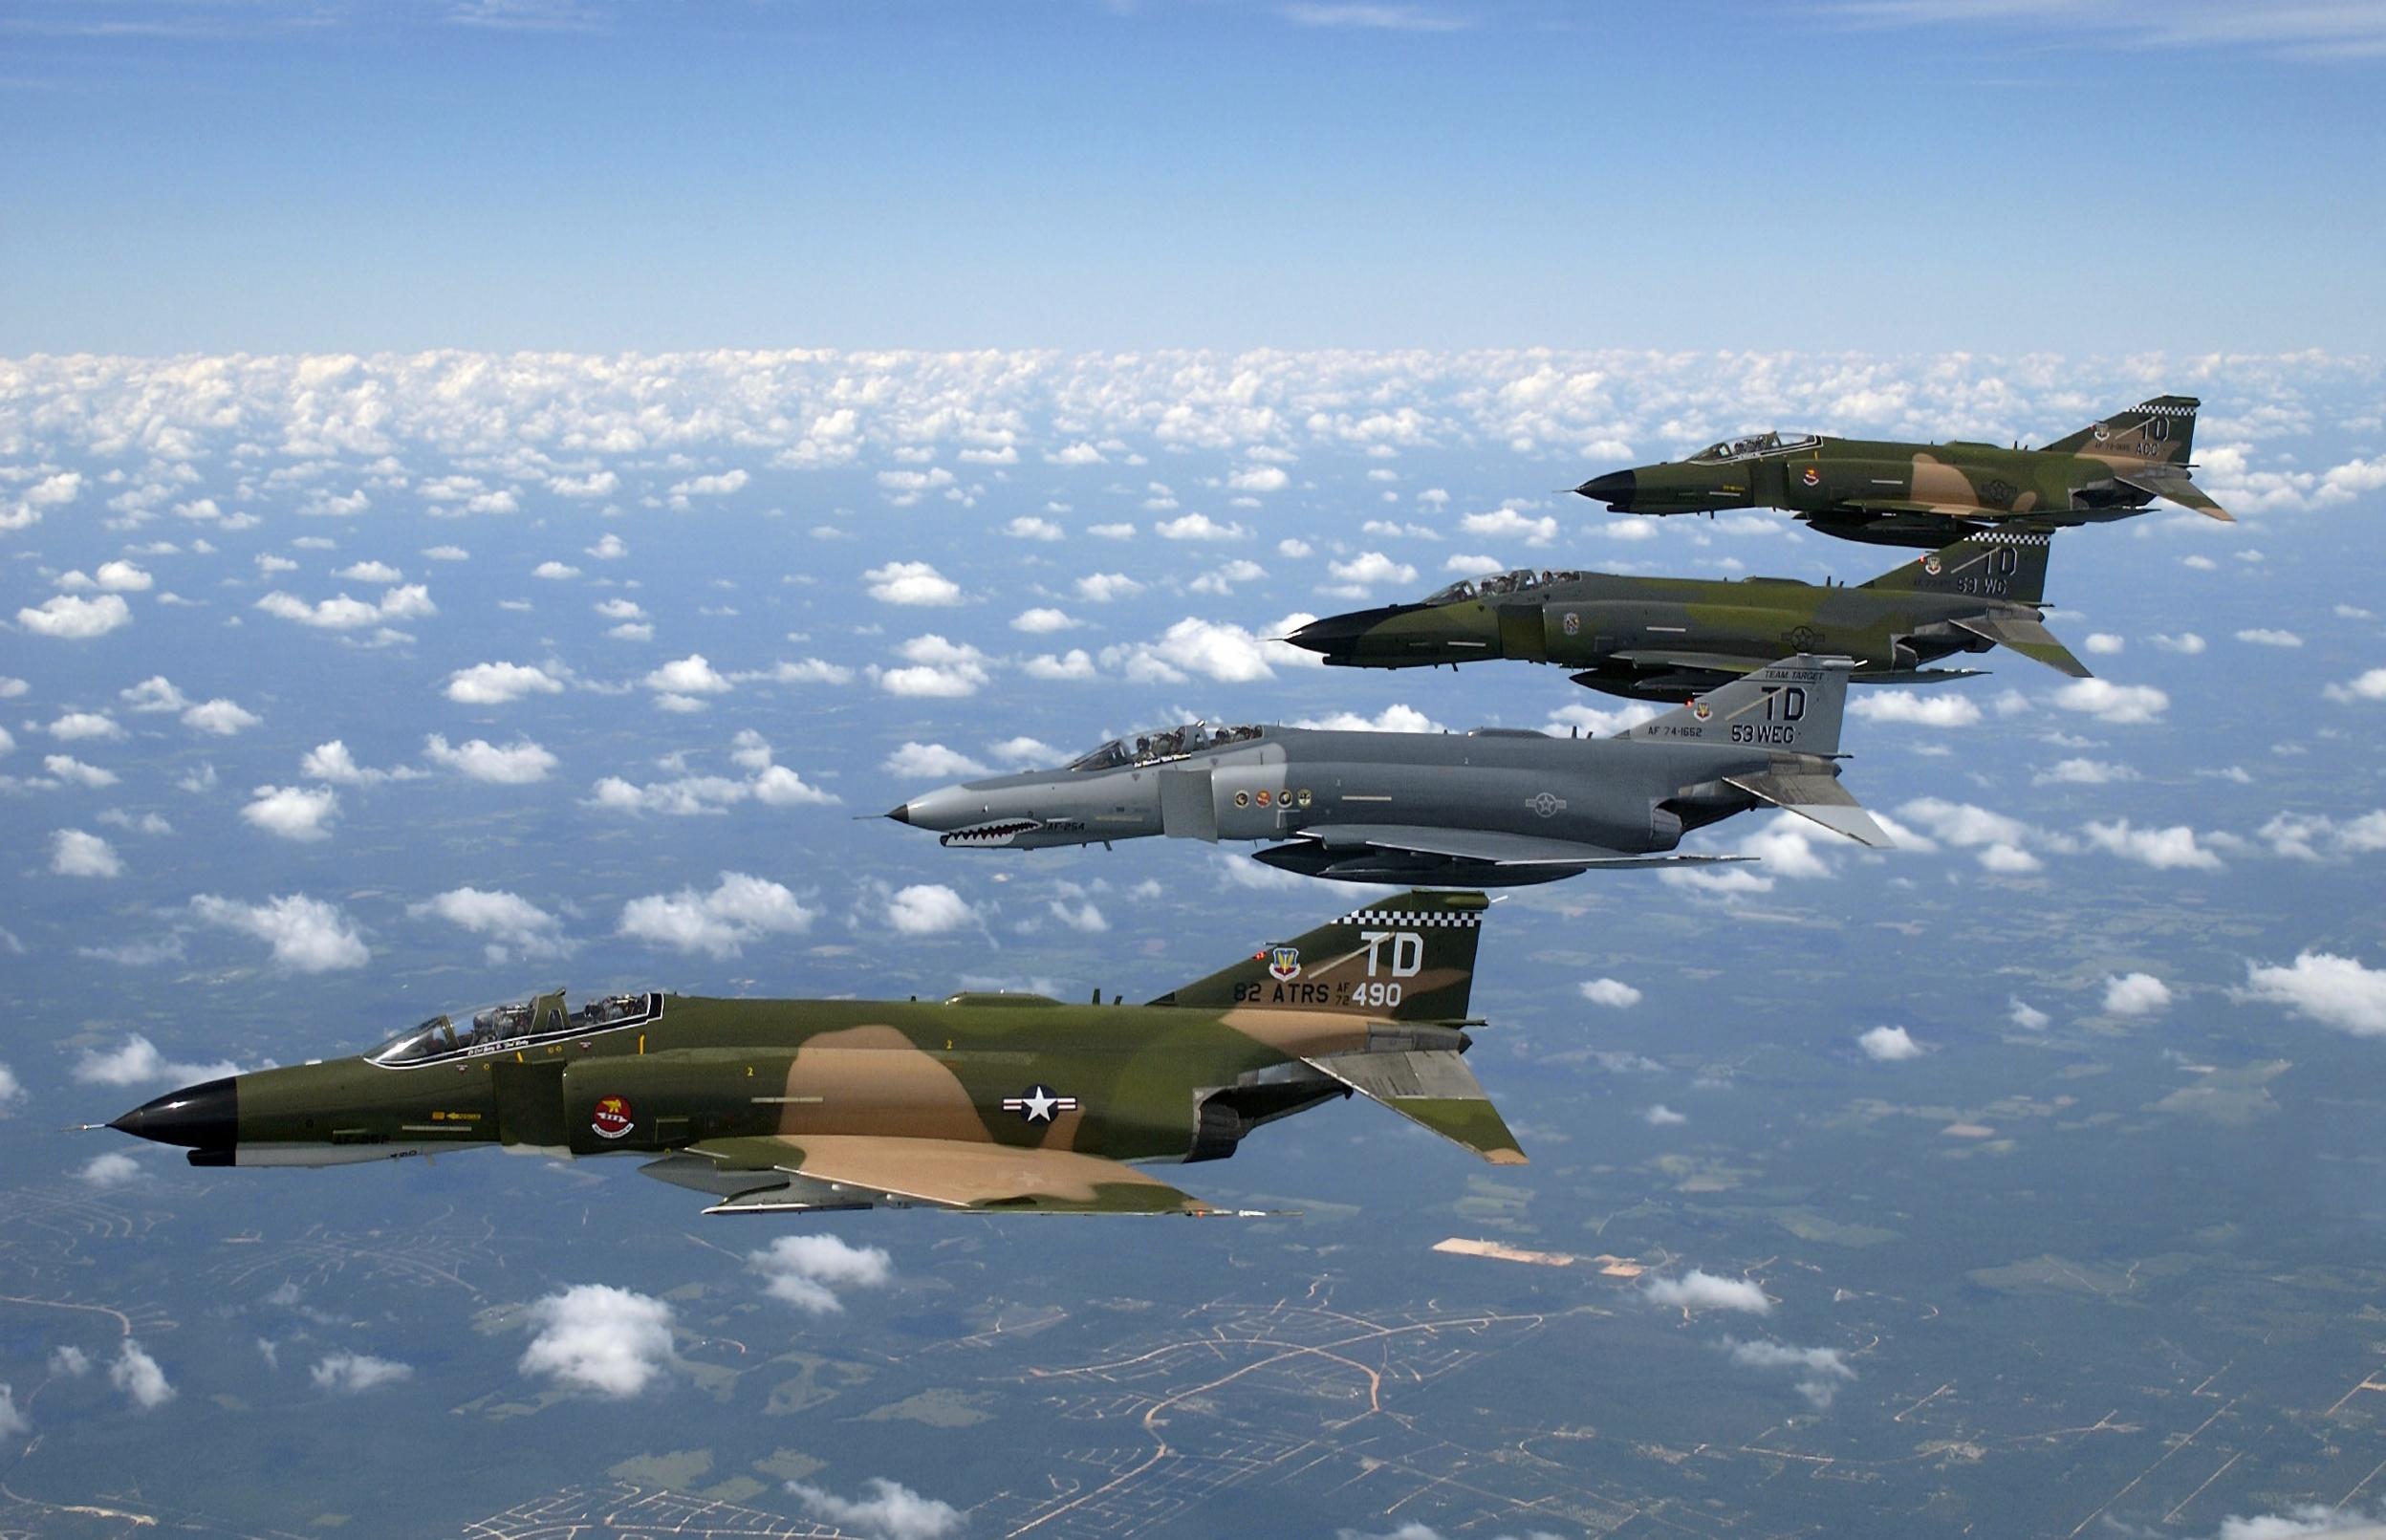 https://i0.wp.com/upload.wikimedia.org/wikipedia/commons/f/f0/1997_F-4_Heritage_Flight_over_Florida-edit_1.jpg